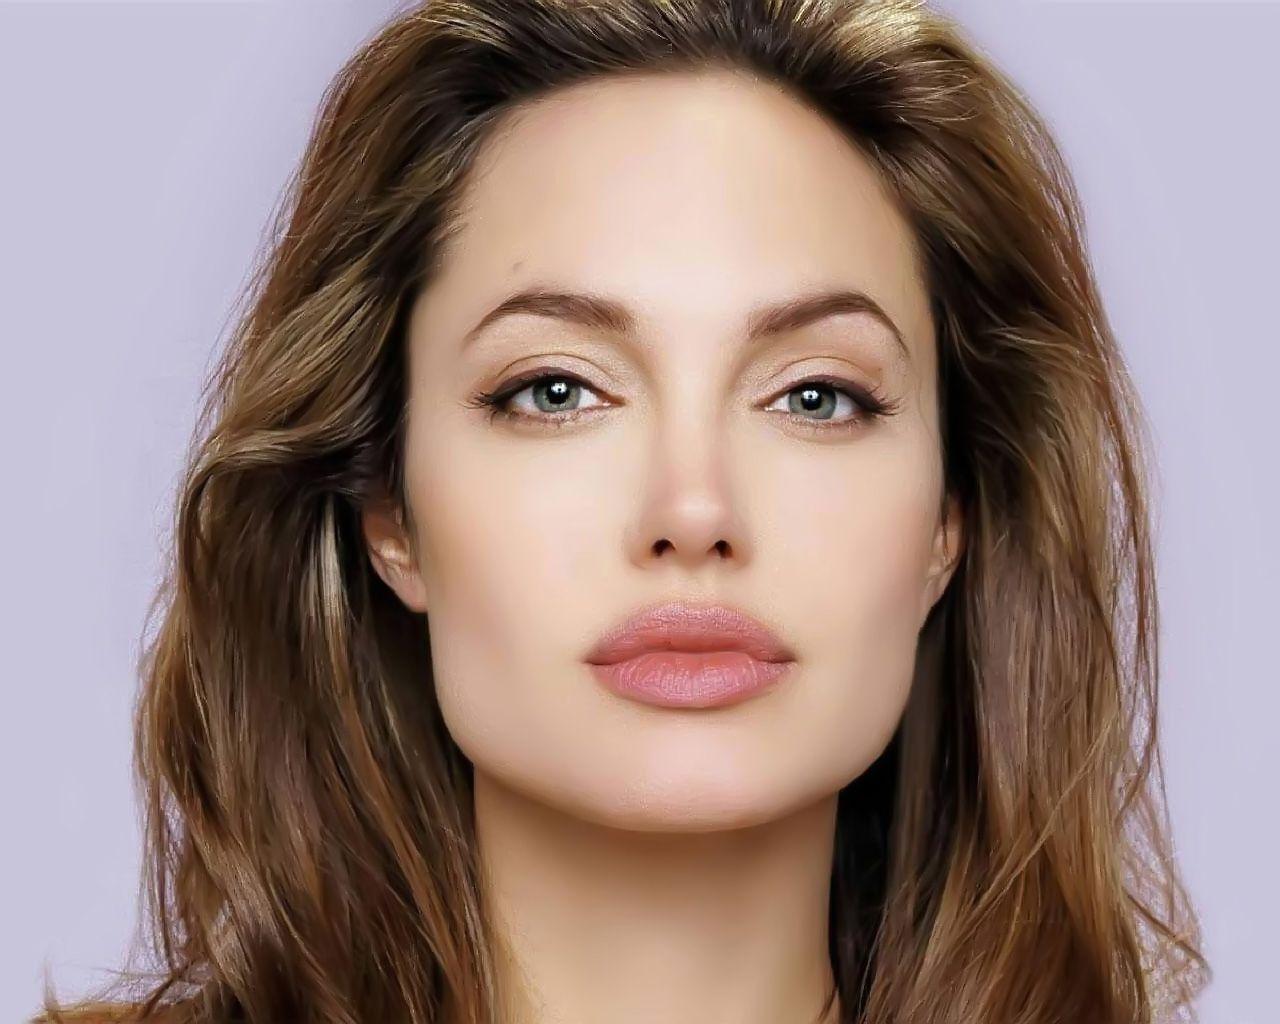 Angelina Jolie Beautiful Dreamer From Original Vaseline Lip Therapy Mini Rasa Plain Forever People 2